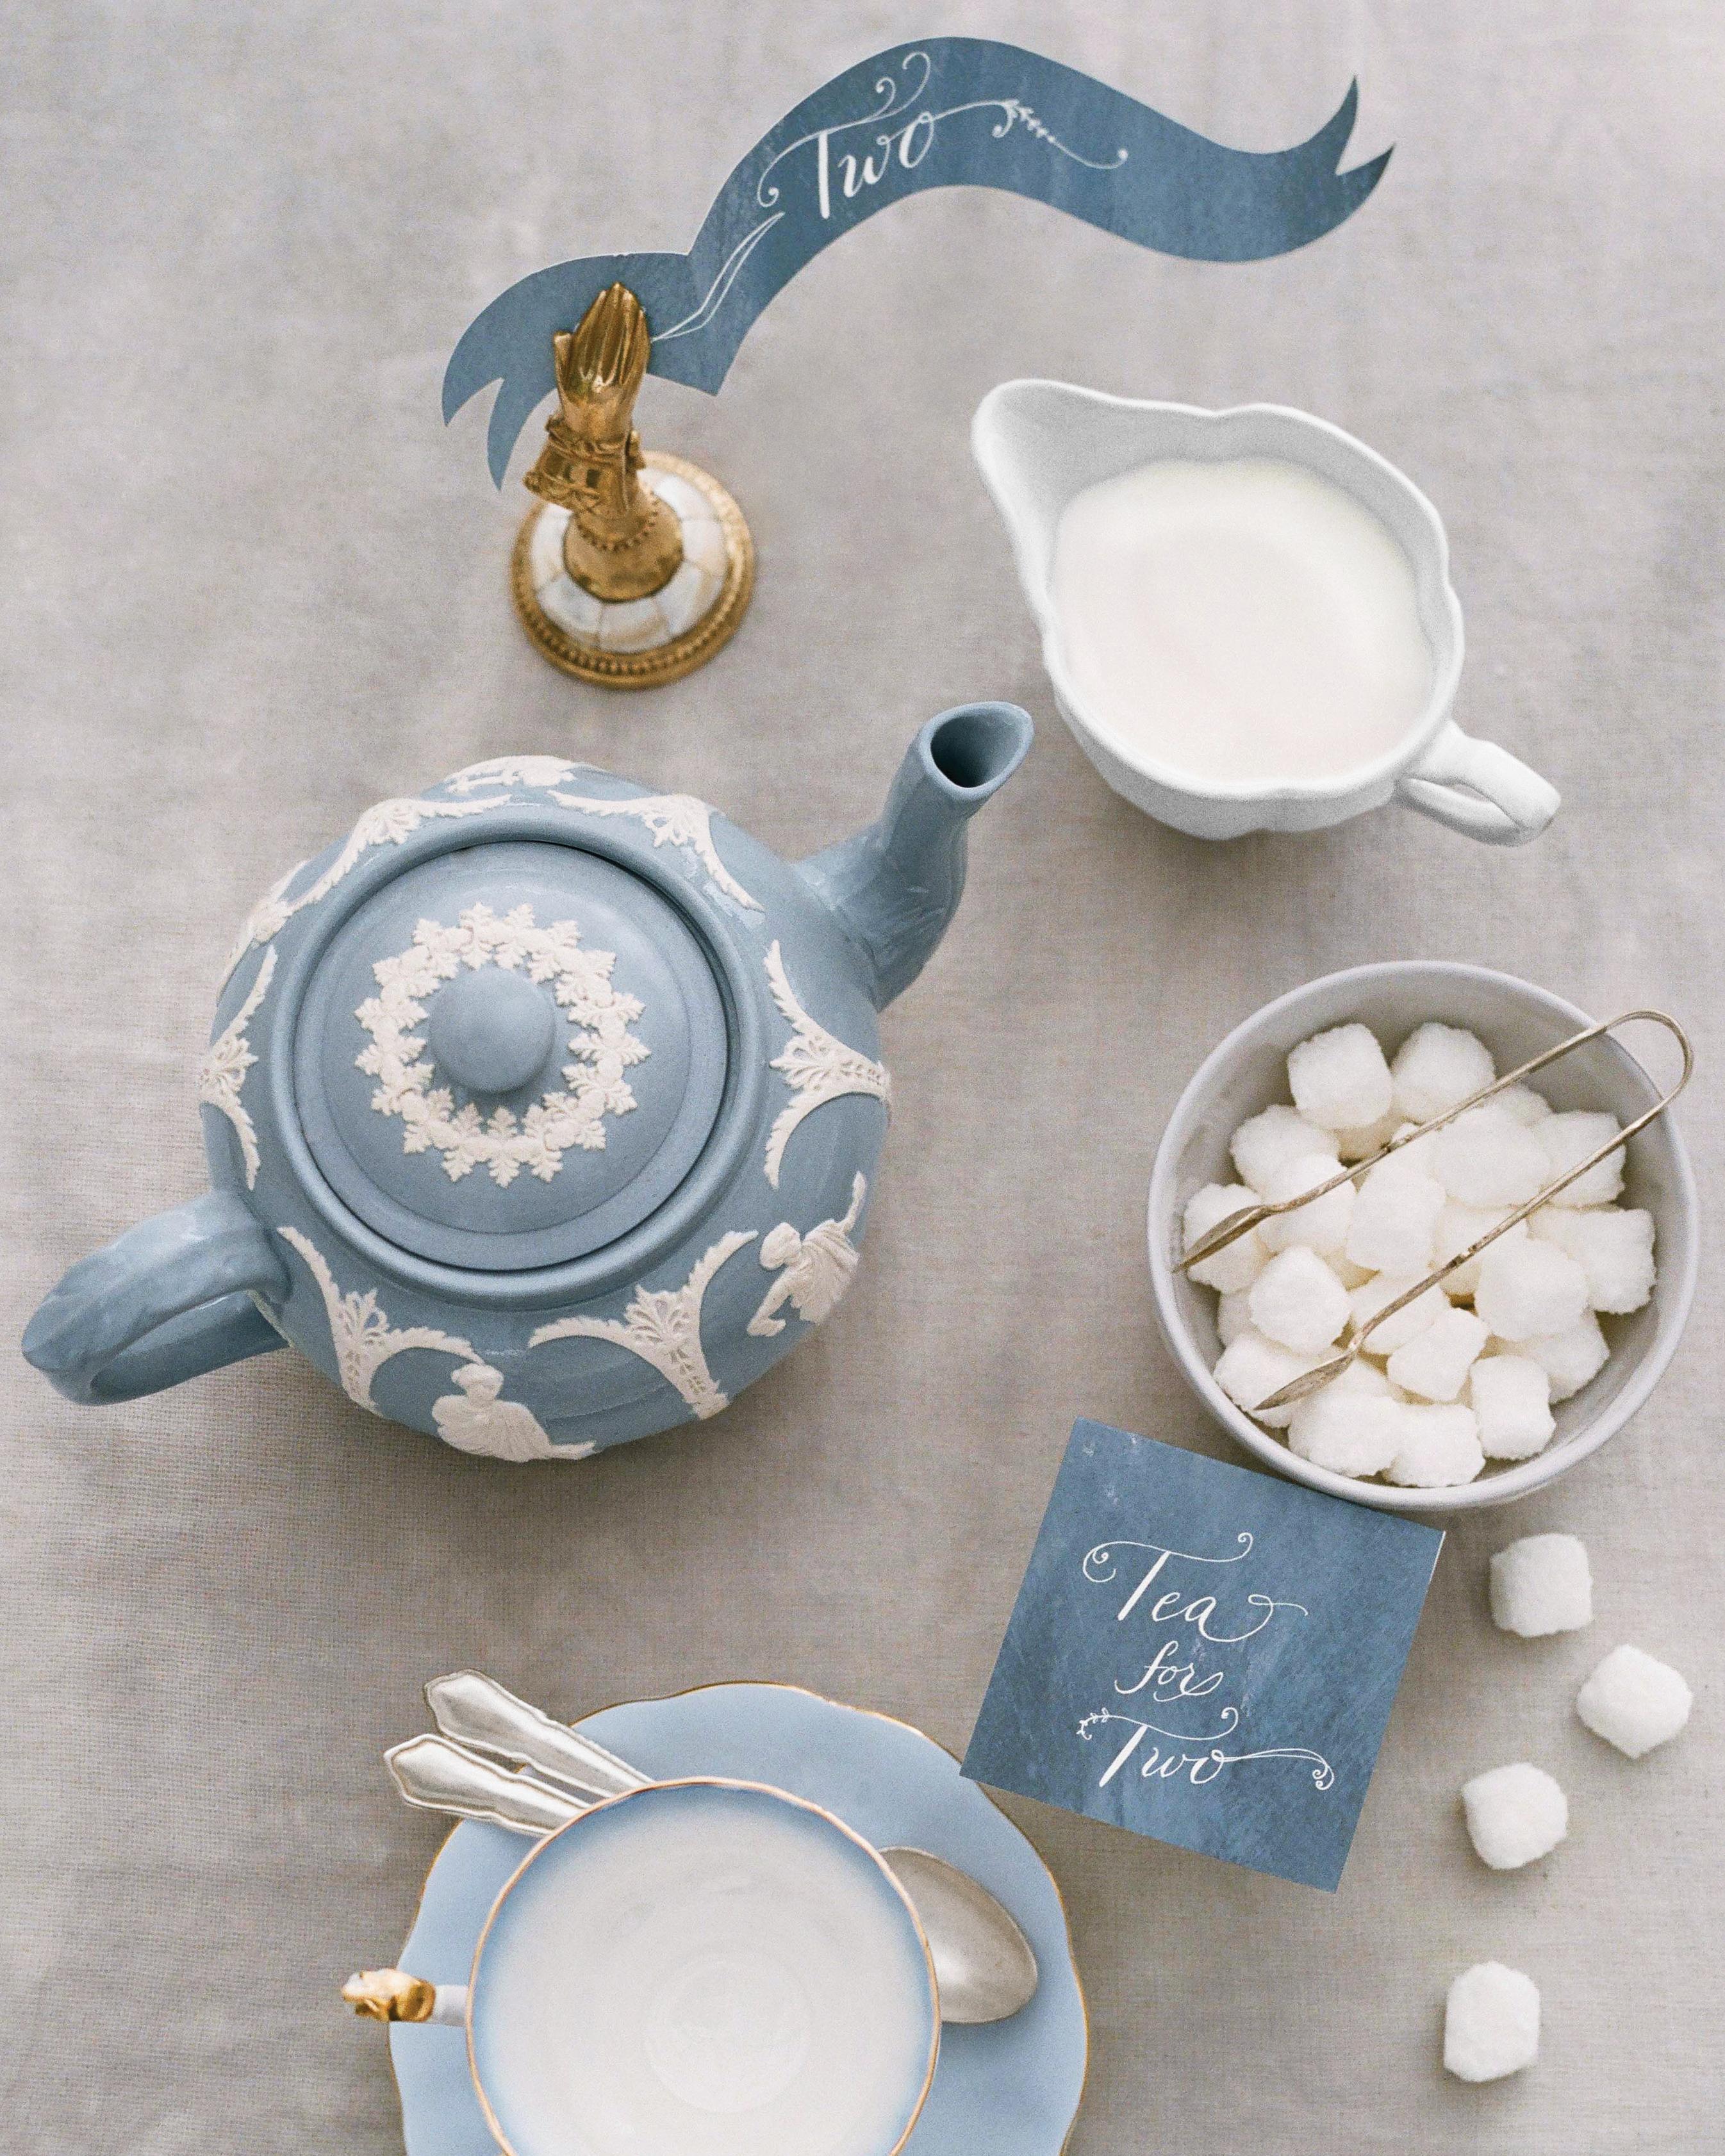 corbin-thatcher-tea-1003-mwds109911.jpg